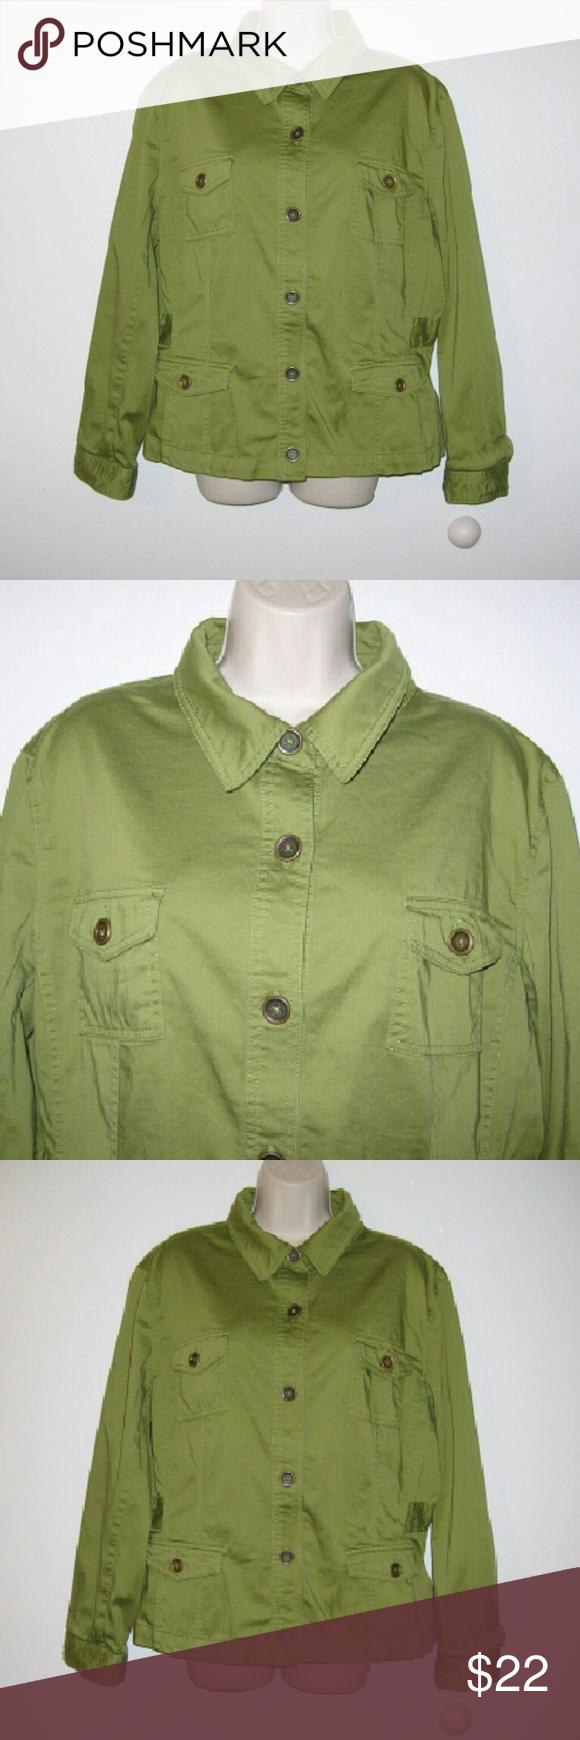 "Jones NY safari army jacket XXL...t The jacket has a bit of stretch It is a dark olive green Bust 50"", long 24"" Shoulder to shoulder 19"" Sleeve 24"" Jones New York Jackets & Coats"